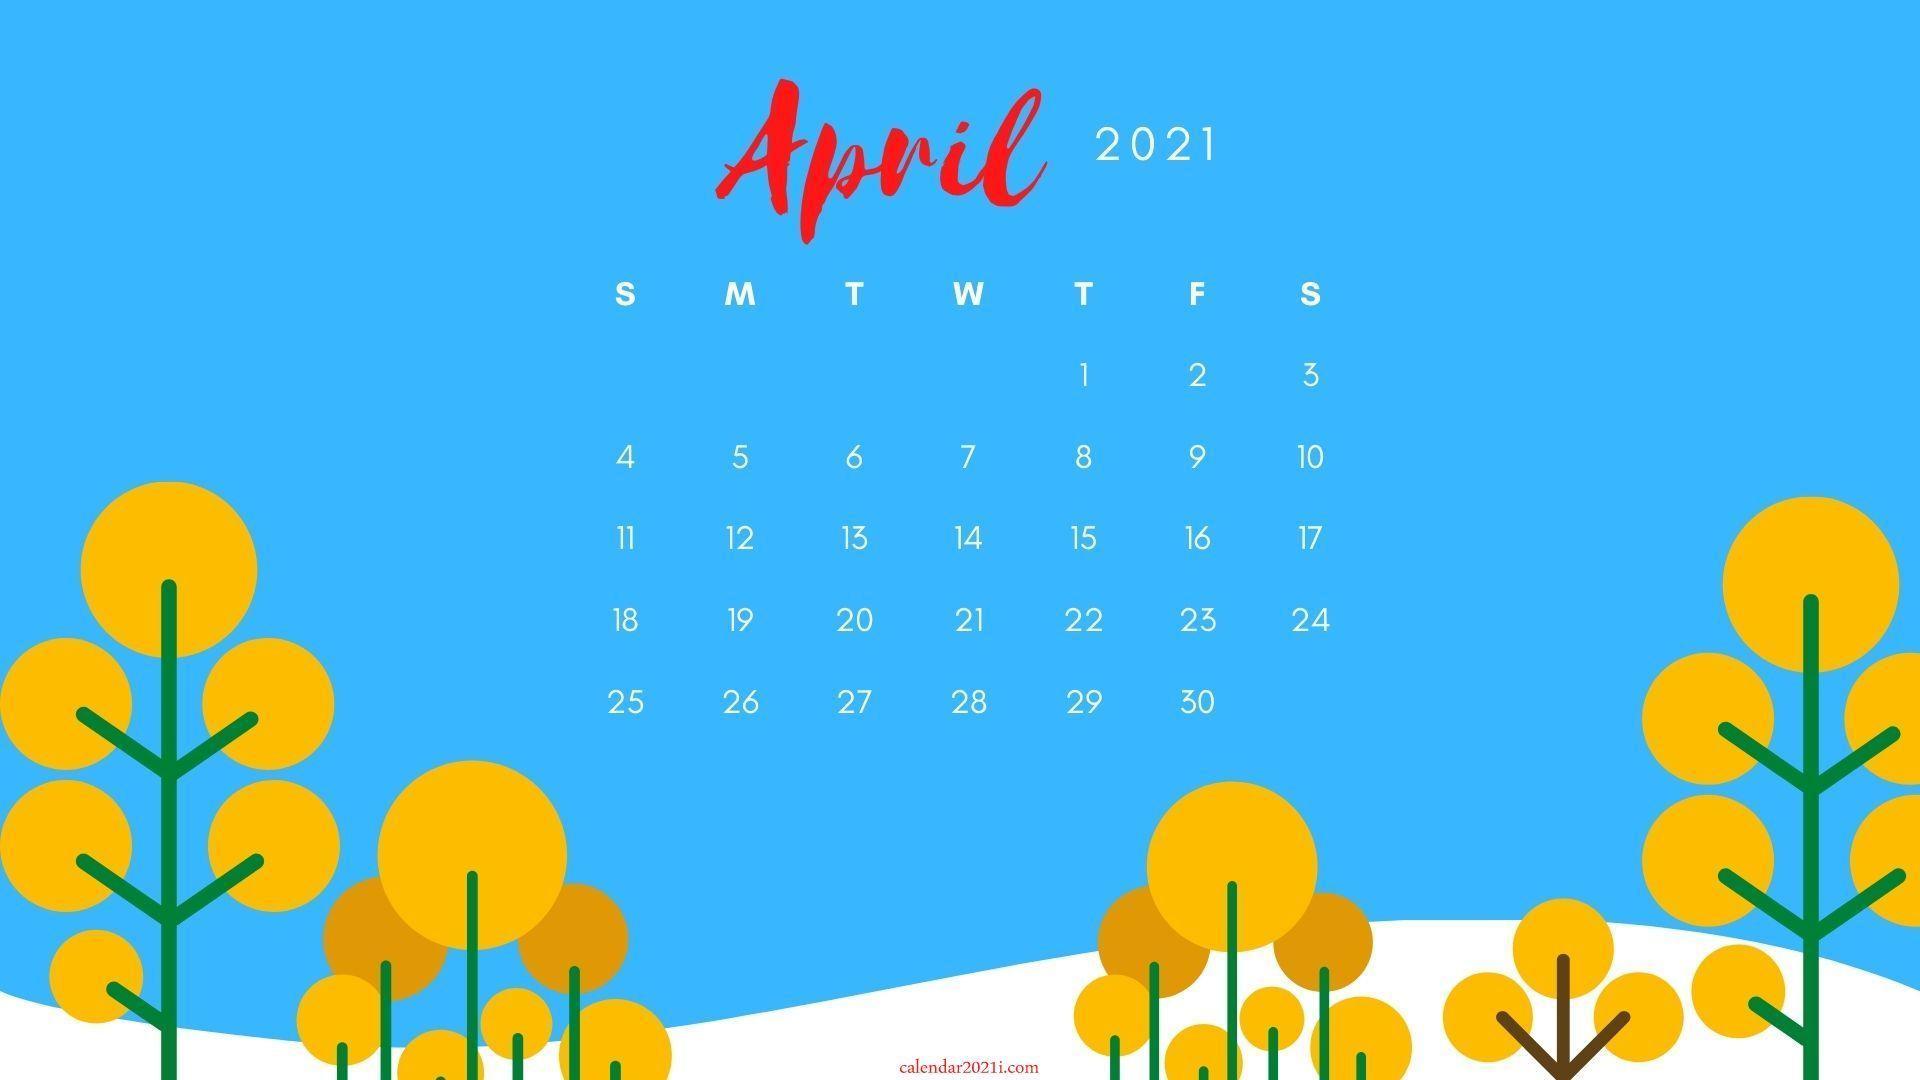 Georgetown Academic Calendar 2022 2023.Downloadcalendar April 2021 25 Best Free Printable April 2021 Calendars Onedesblog April 2021 Calendar Are Printable Calendars That You Can Directly Print And Download Janeskreativiteter